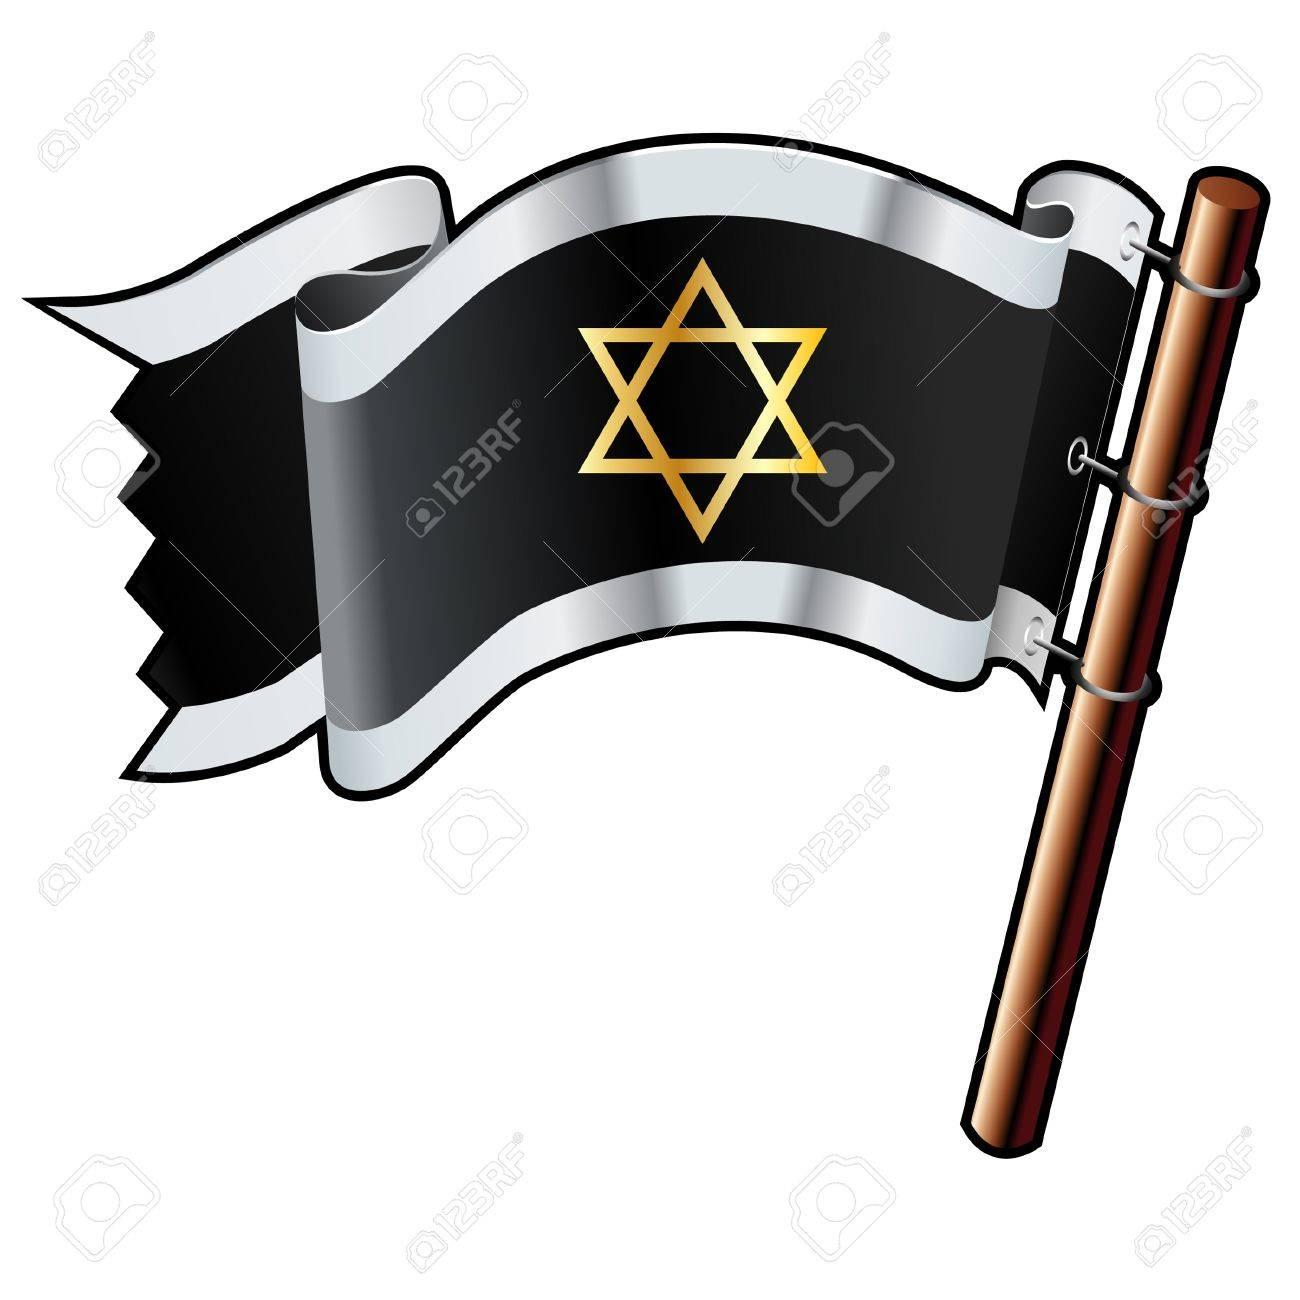 star of david jewish religious icon on black silver and gold rh 123rf com Jewish Border Clip Art Jewish Star Clip Art Black and White